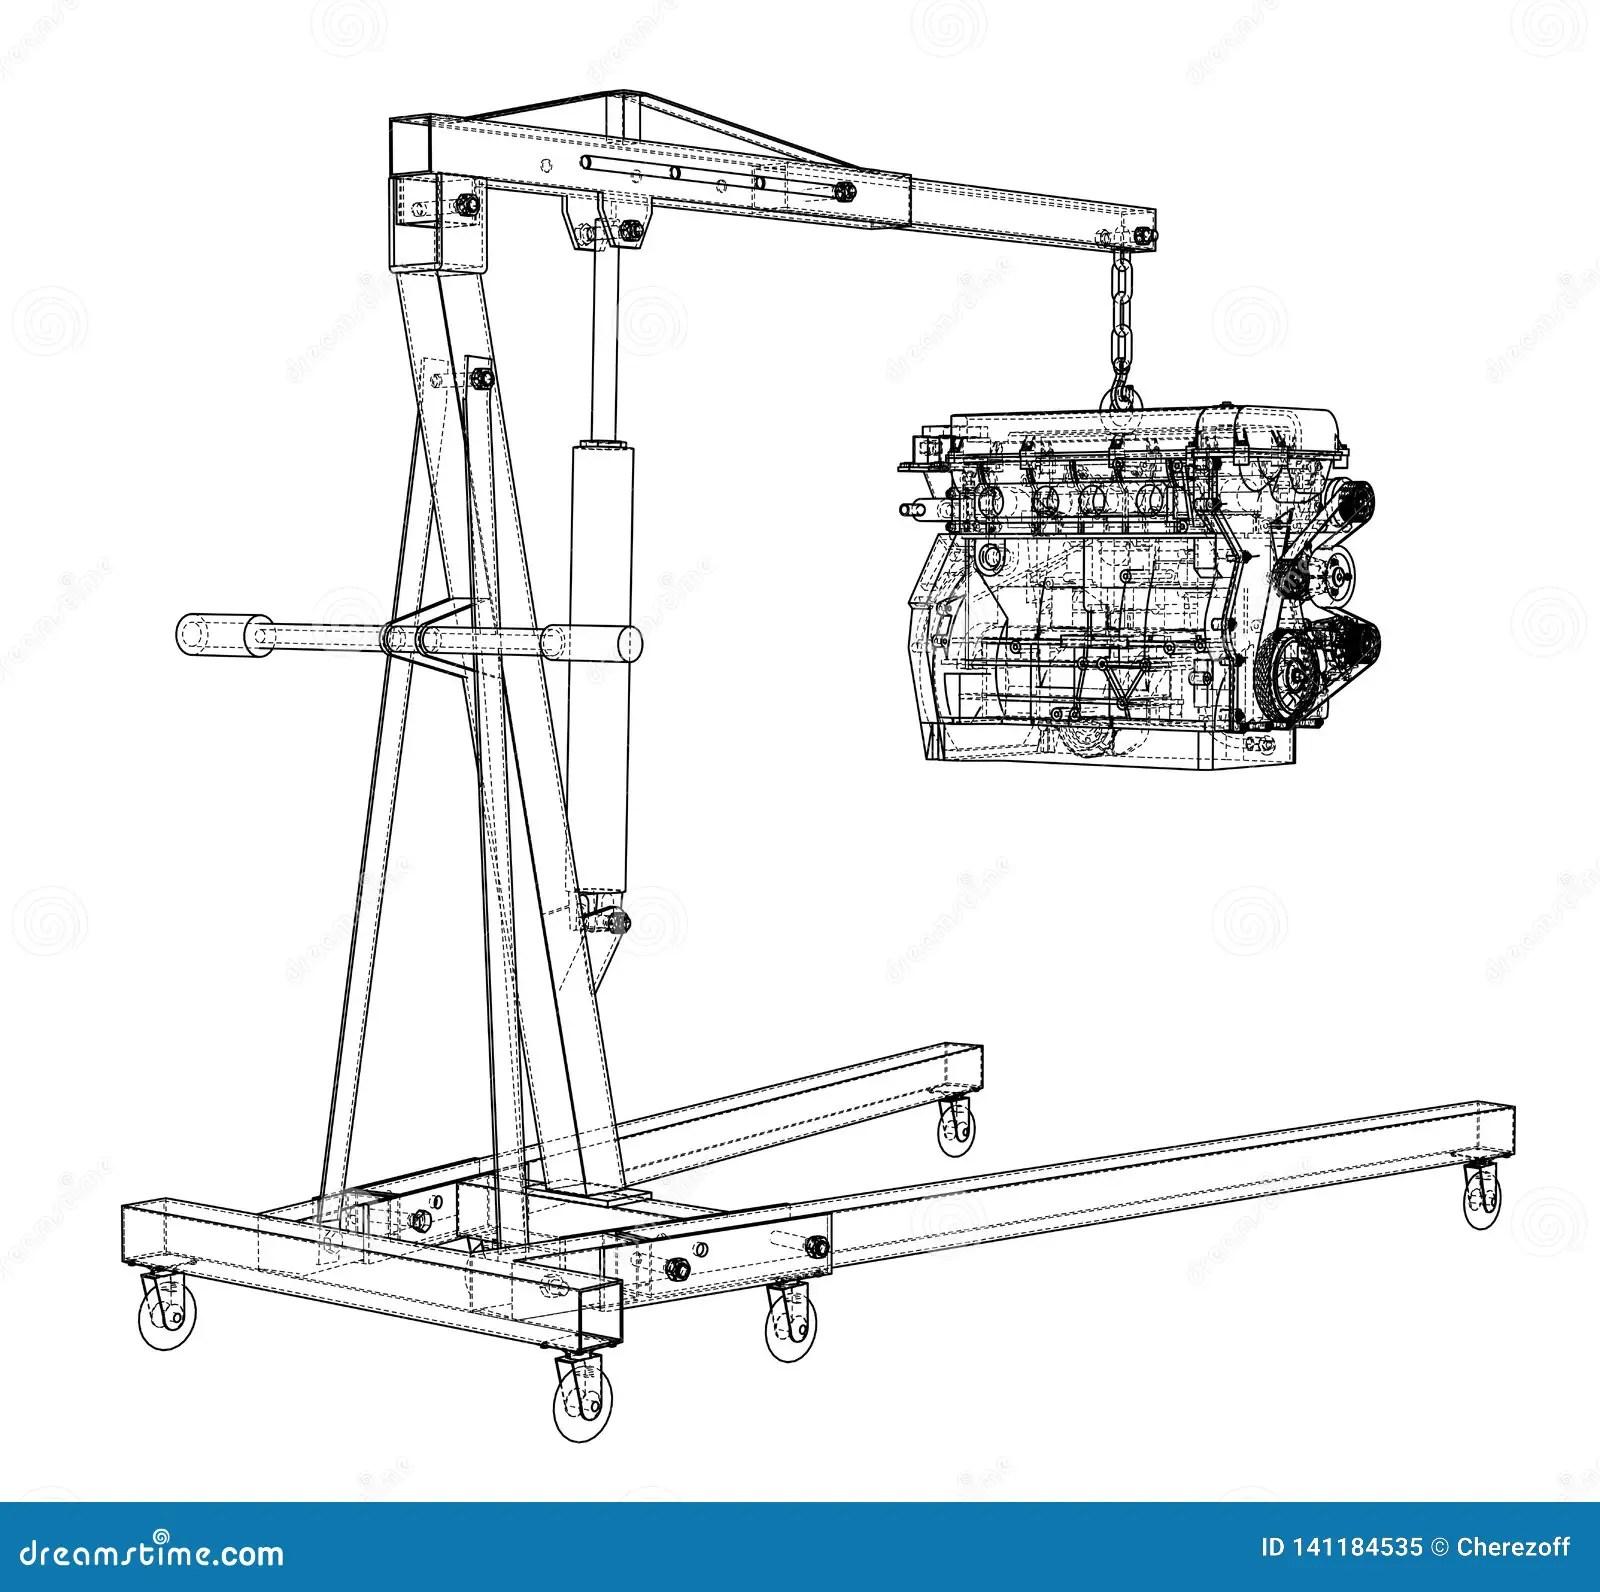 hight resolution of engine hoist with engine outline stock vector illustration of engine hoist diagram